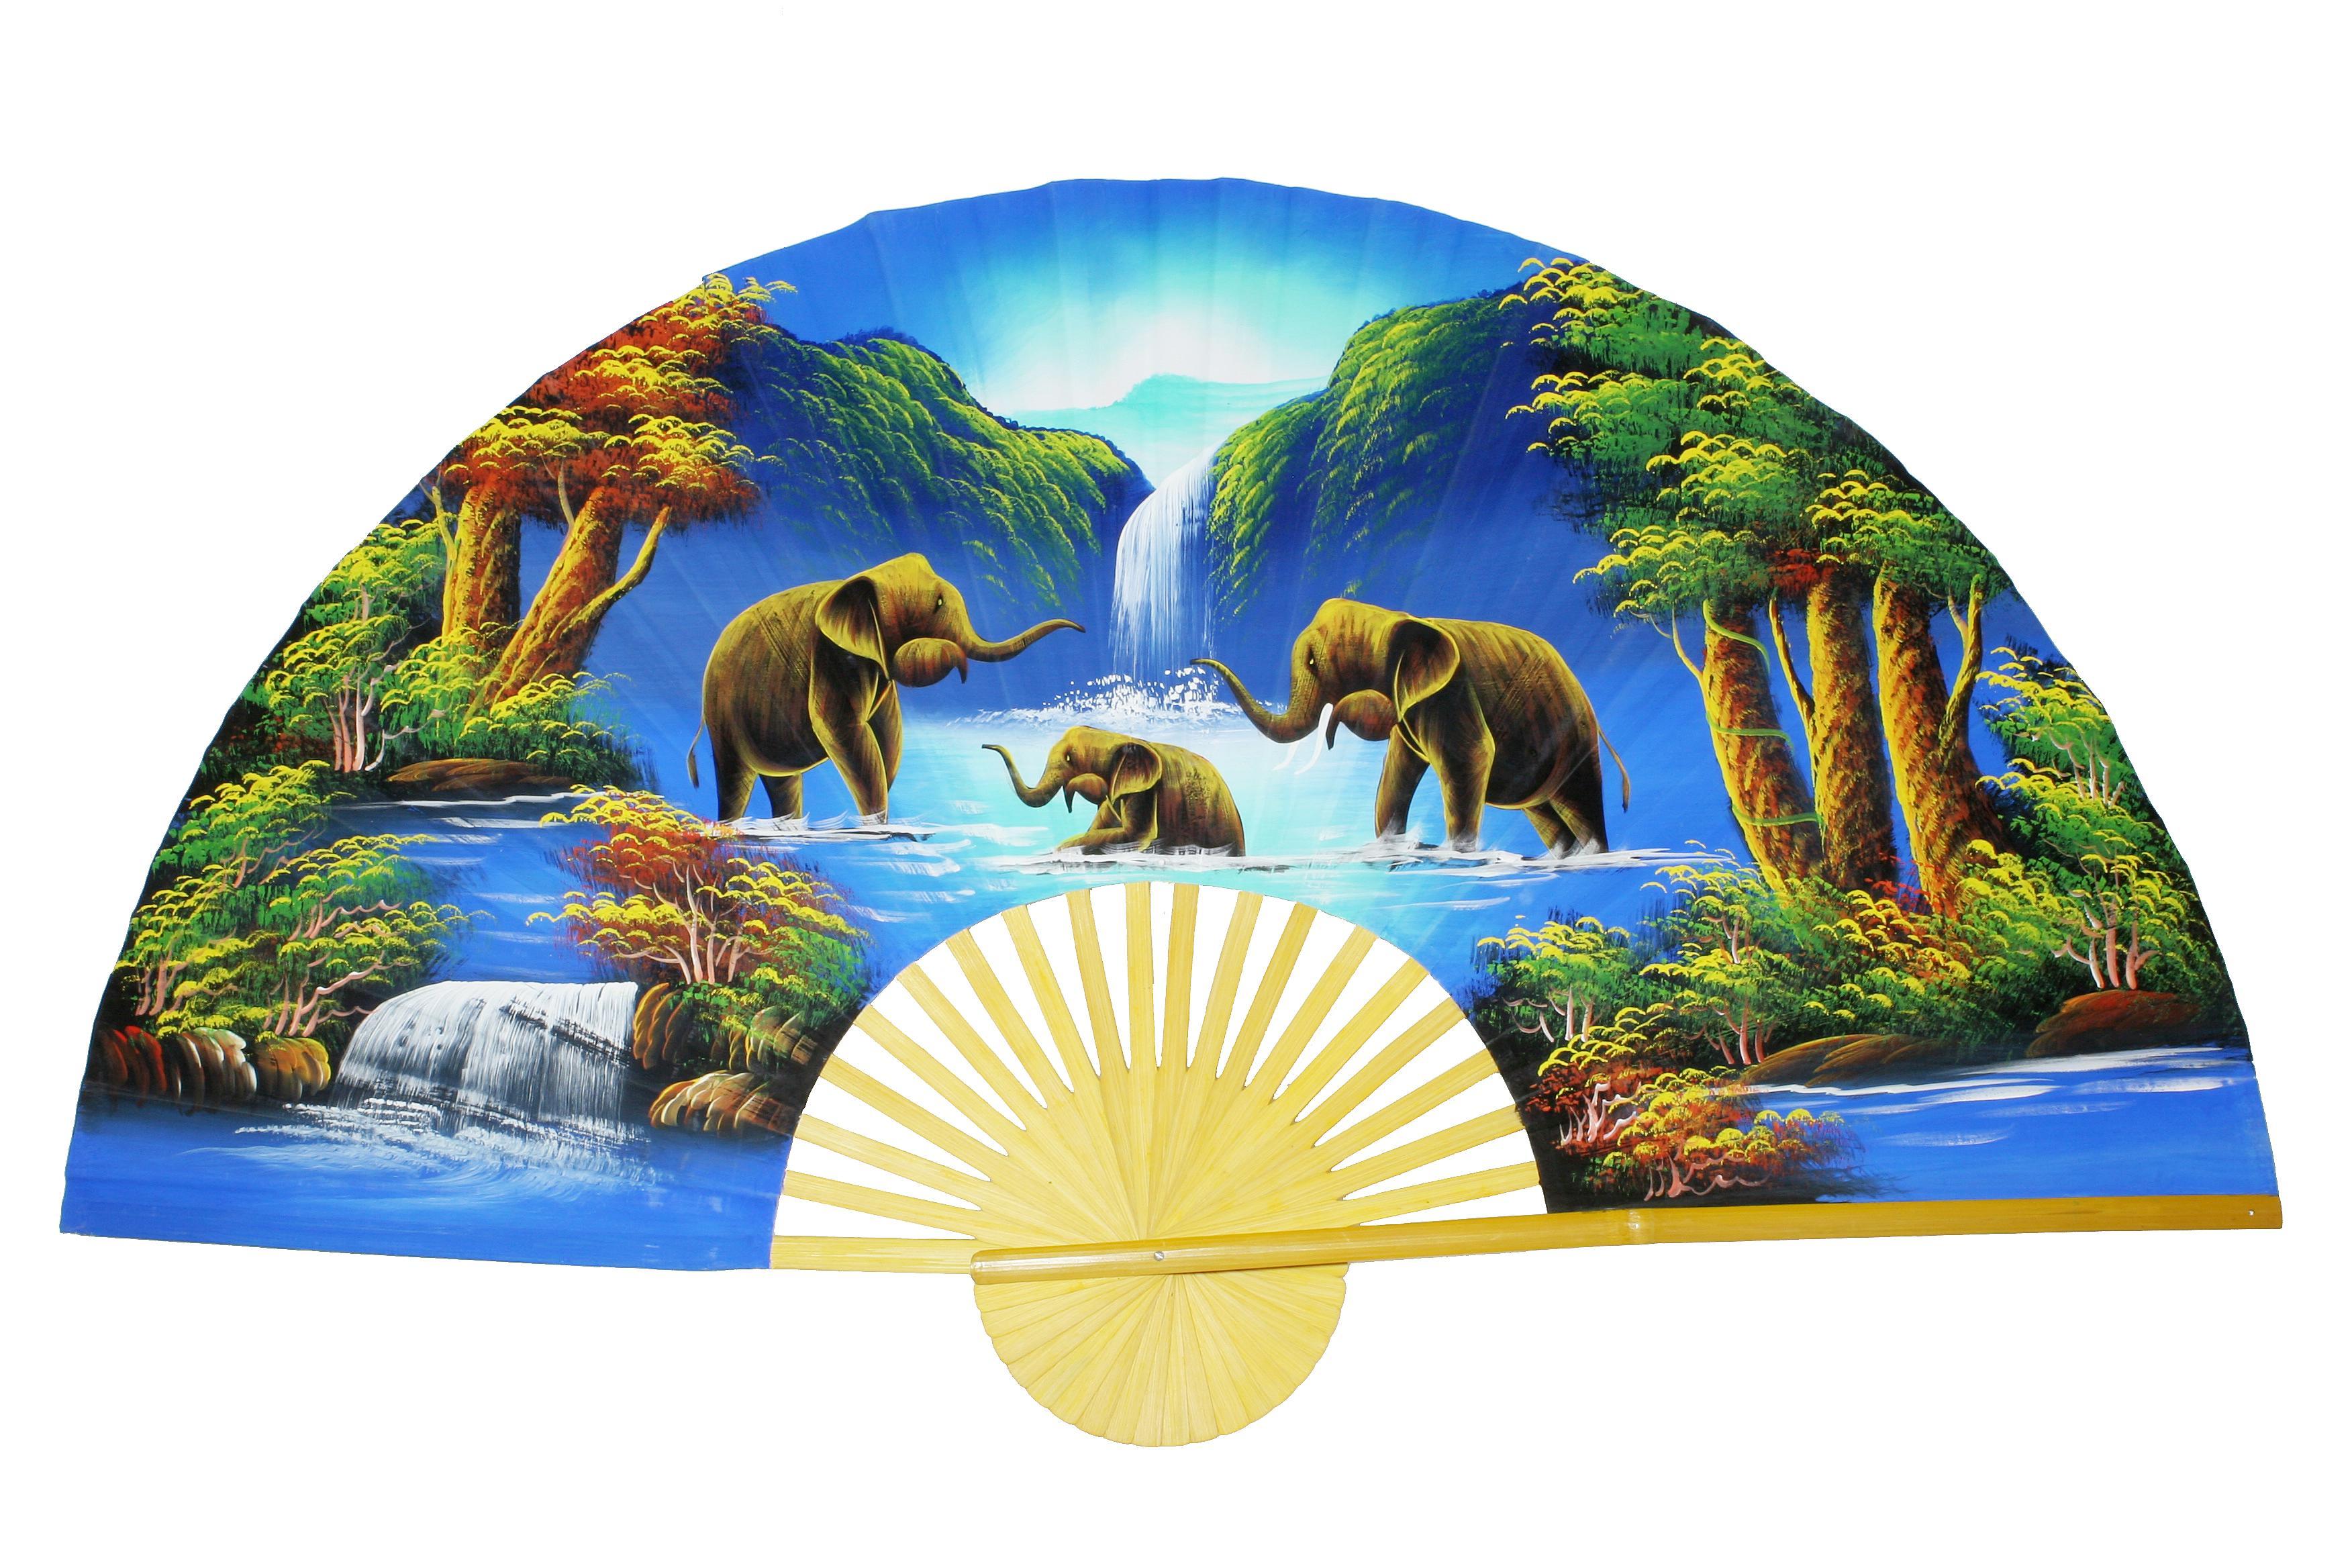 Wandfächer von Hand bemalt (Elefanten)